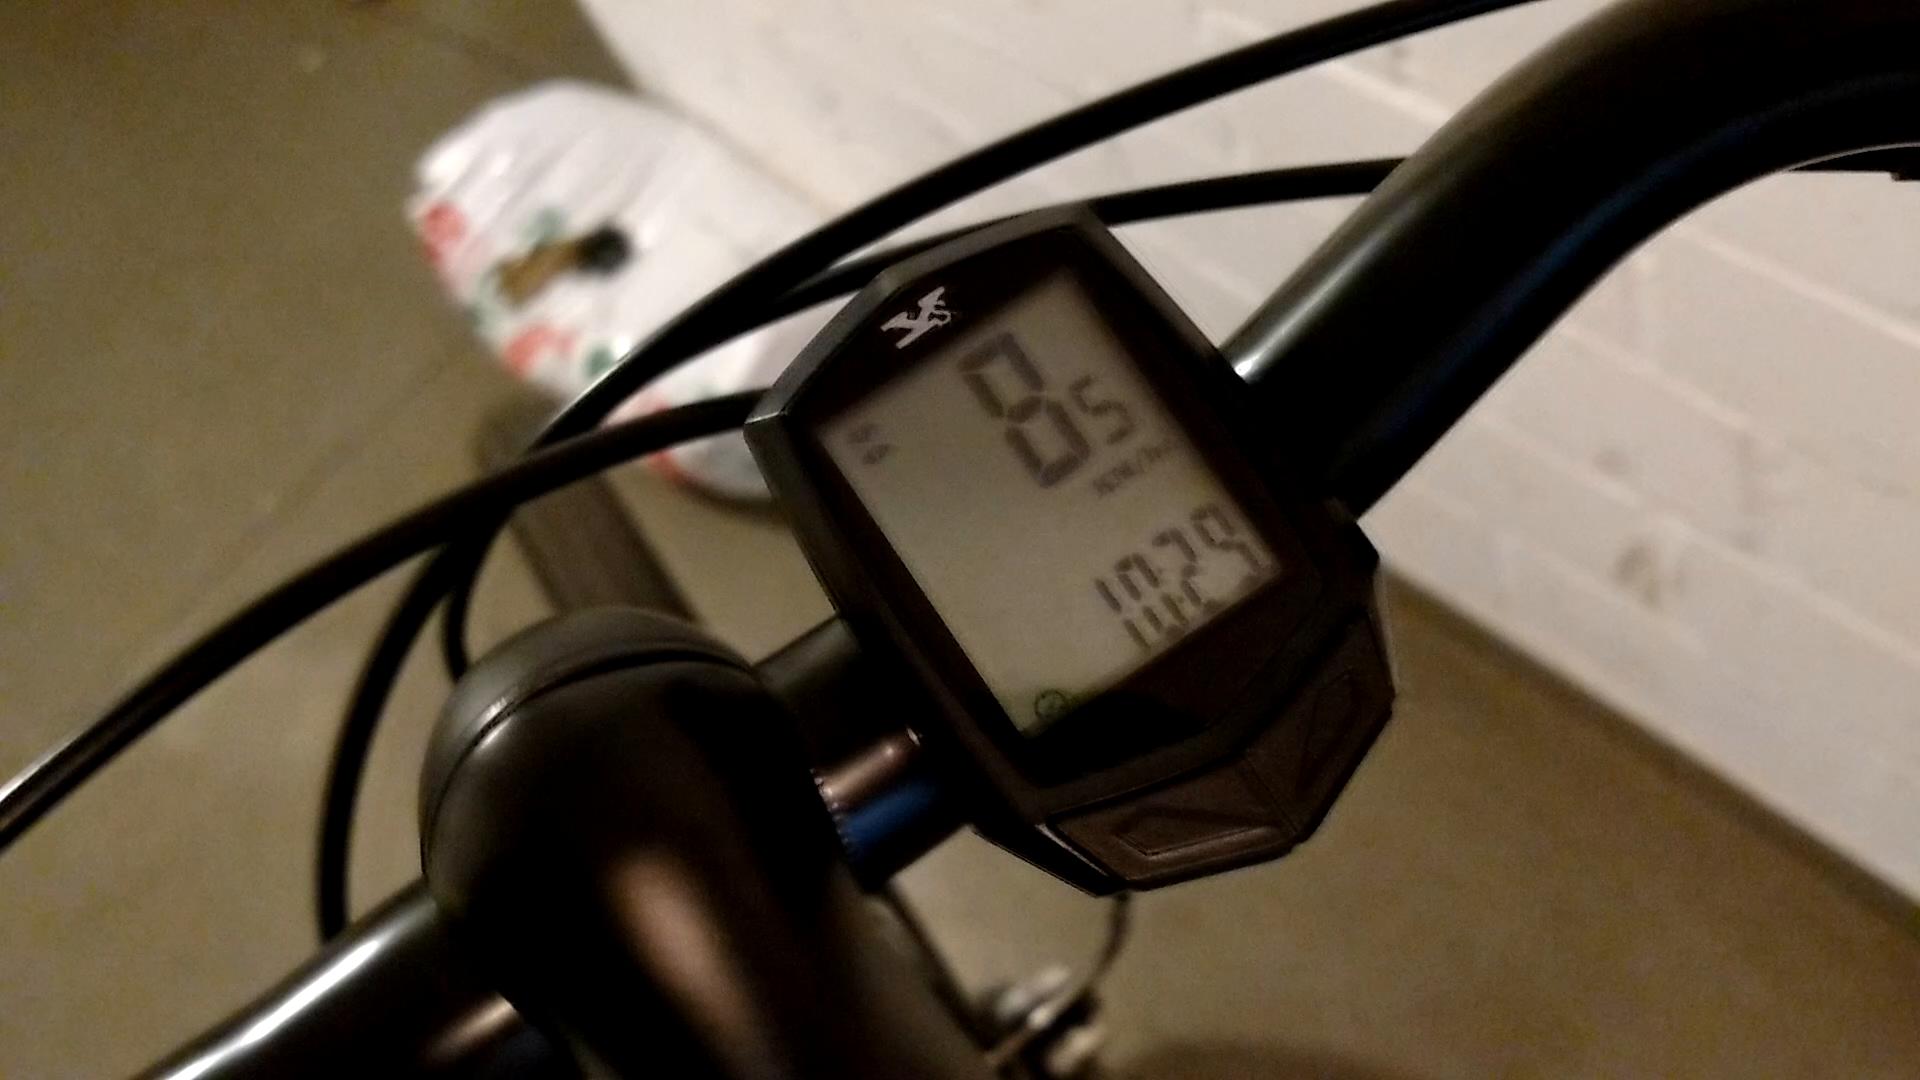 Fahrradcomputer Wo Anbringen : Echoice fahrradcomputer kabellos tacho für fahrrad tachometer